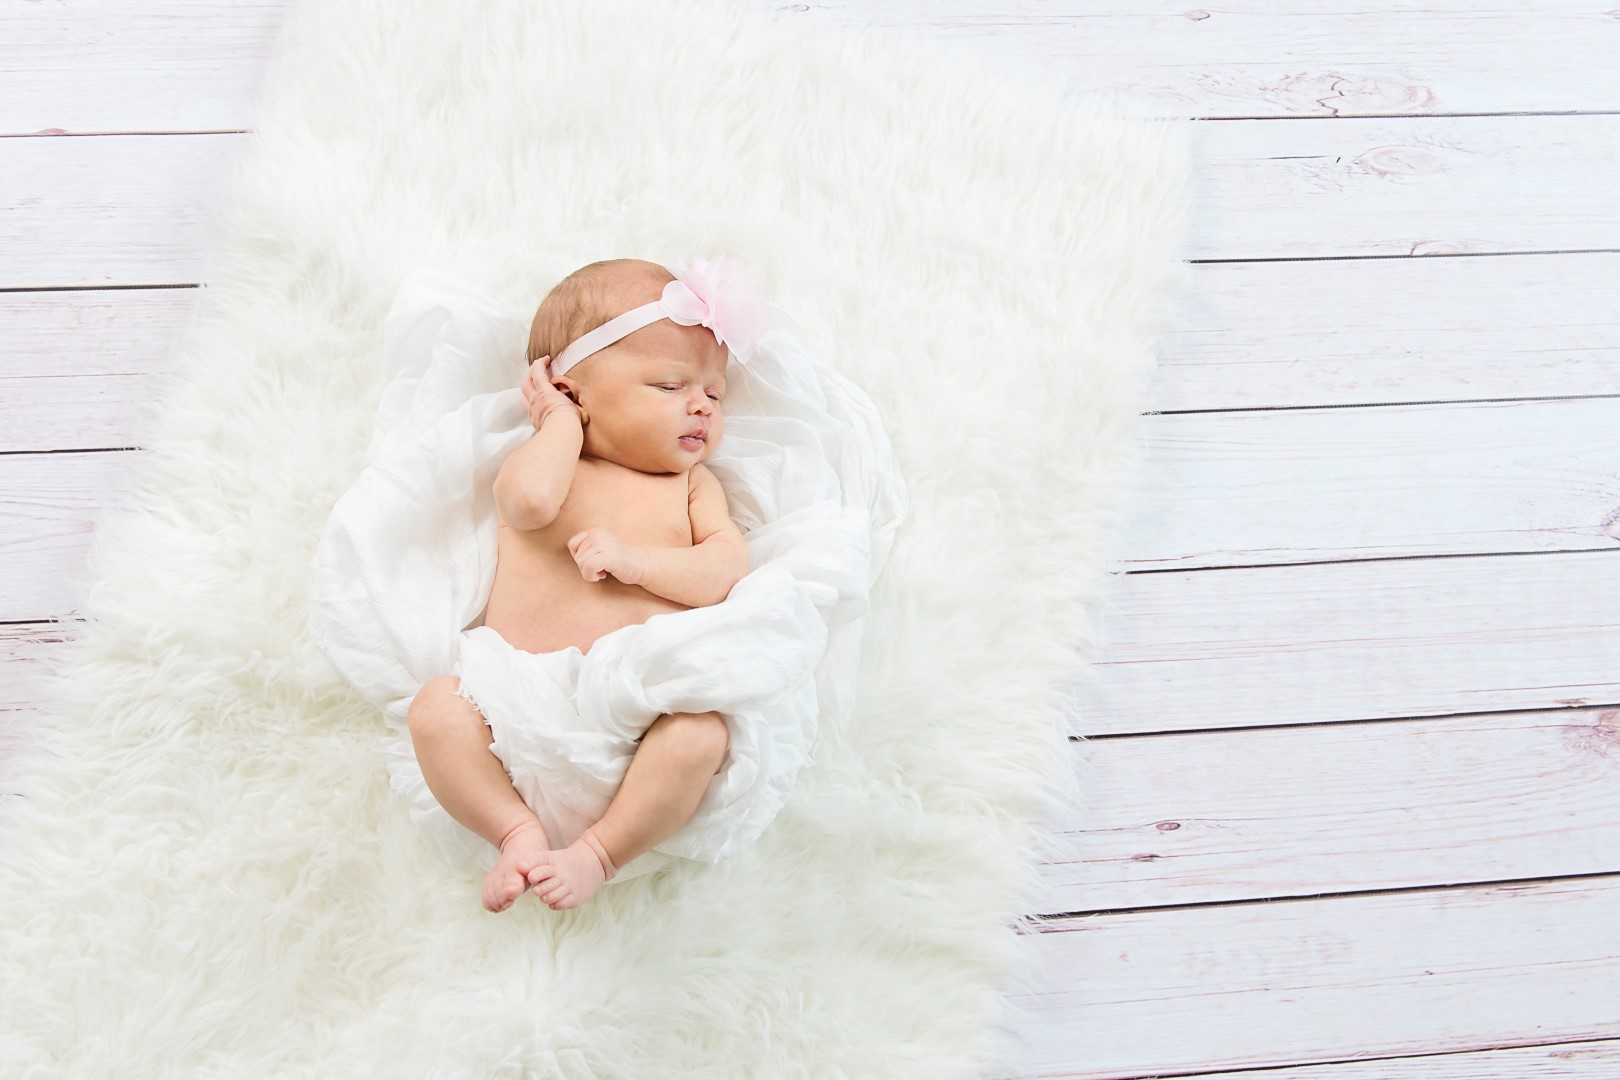 Baby_Parker_Newborn_07 (Large).jpg